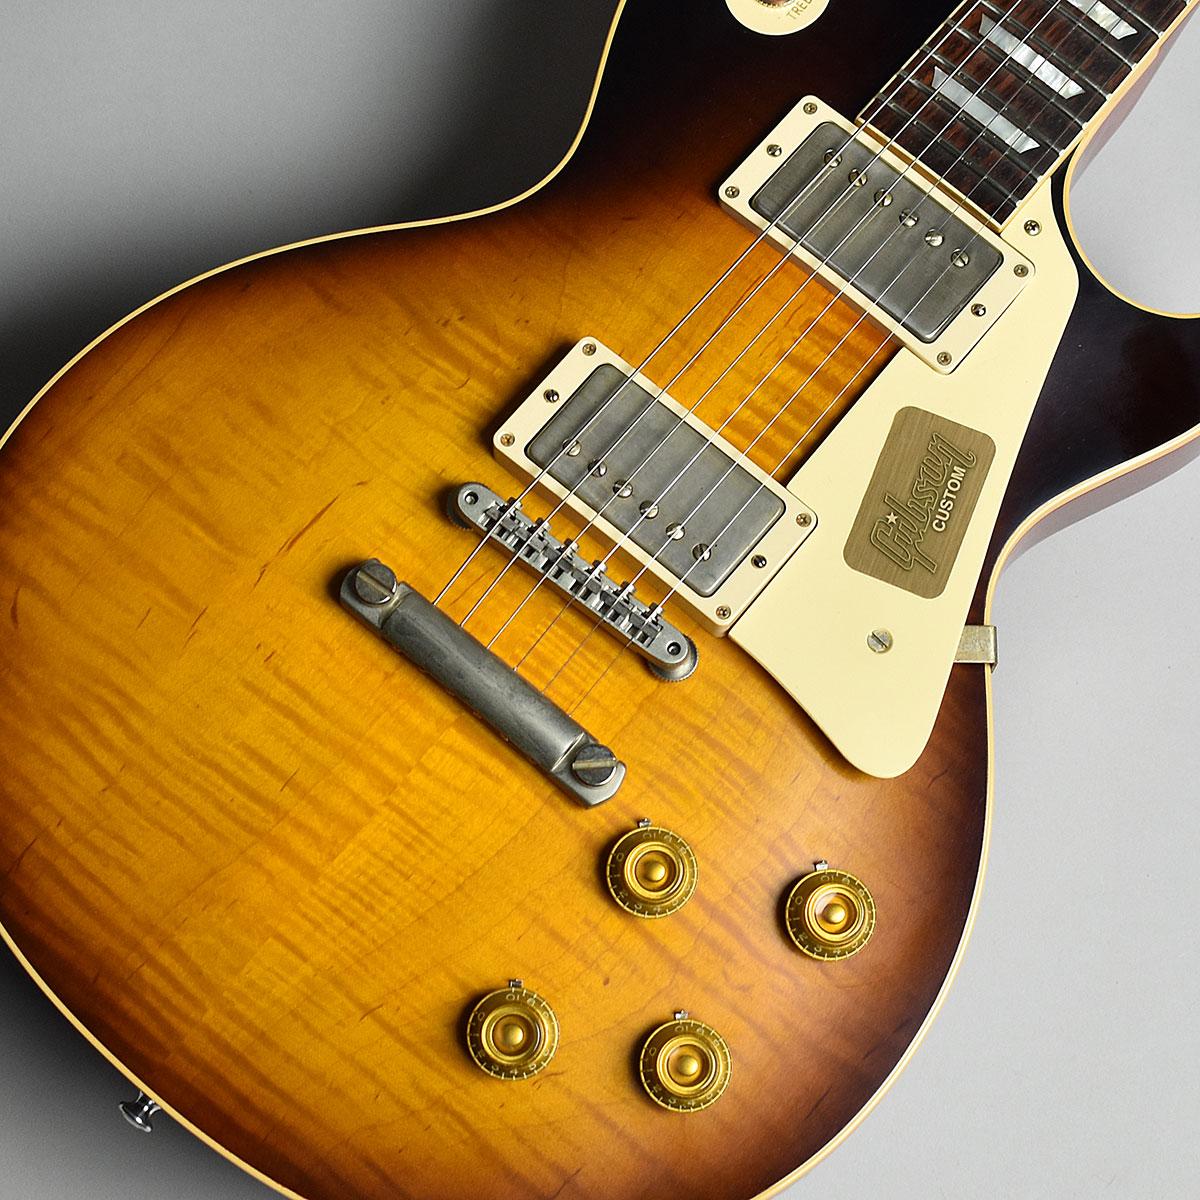 Gibson Custom Shop 1959 Les Paul Standard VOS Kindred Burst Fade S/N:971297 【ギブソン カスタムショップ】【未展示品】